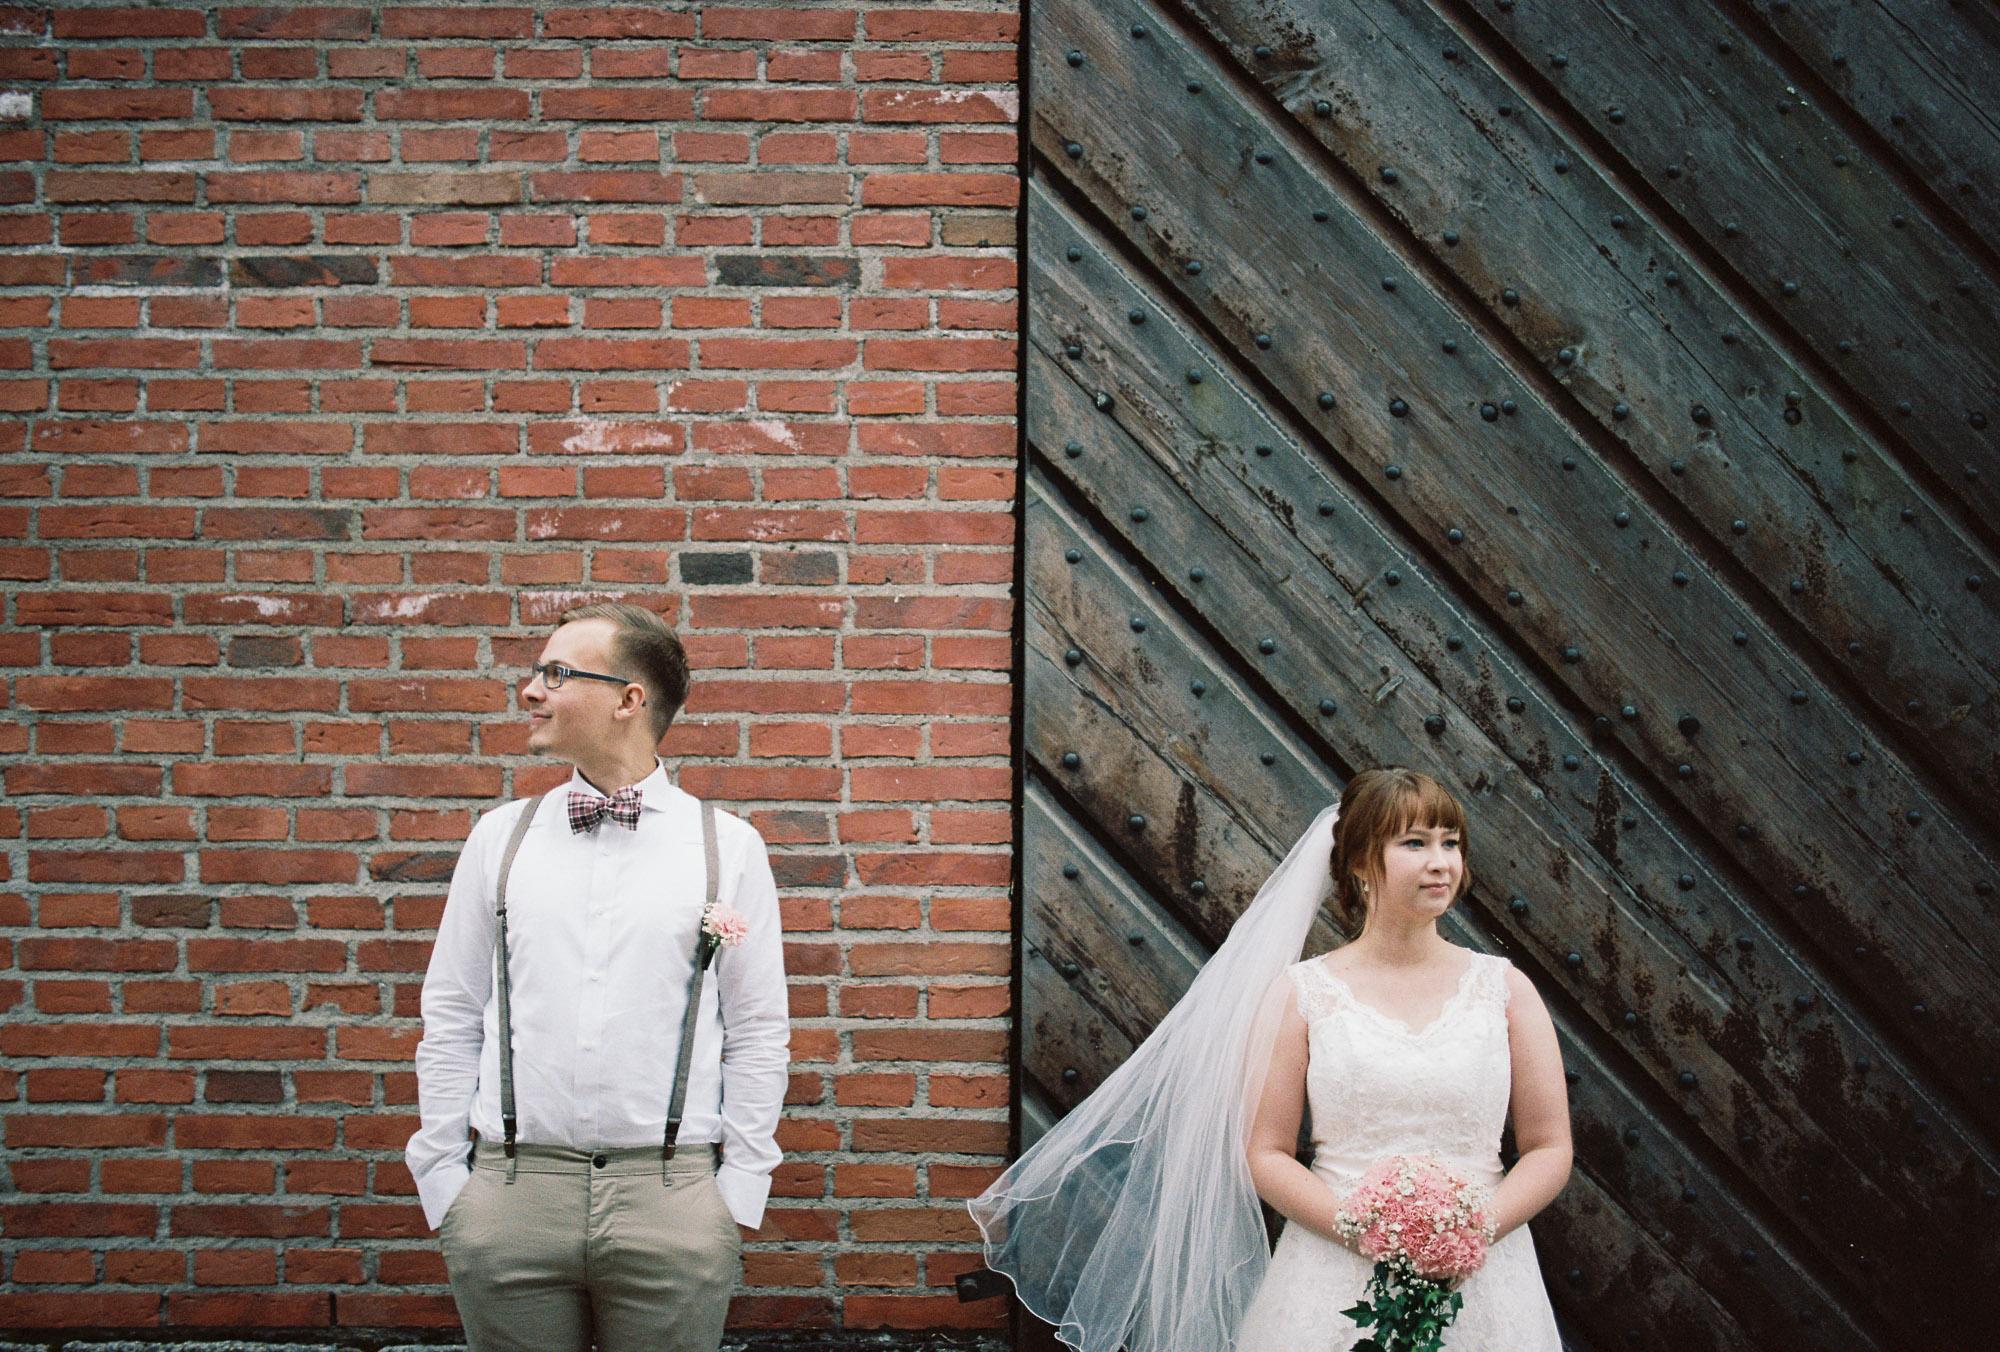 jere-satamo-analog-film-wedding-photographer-finland-162.jpg